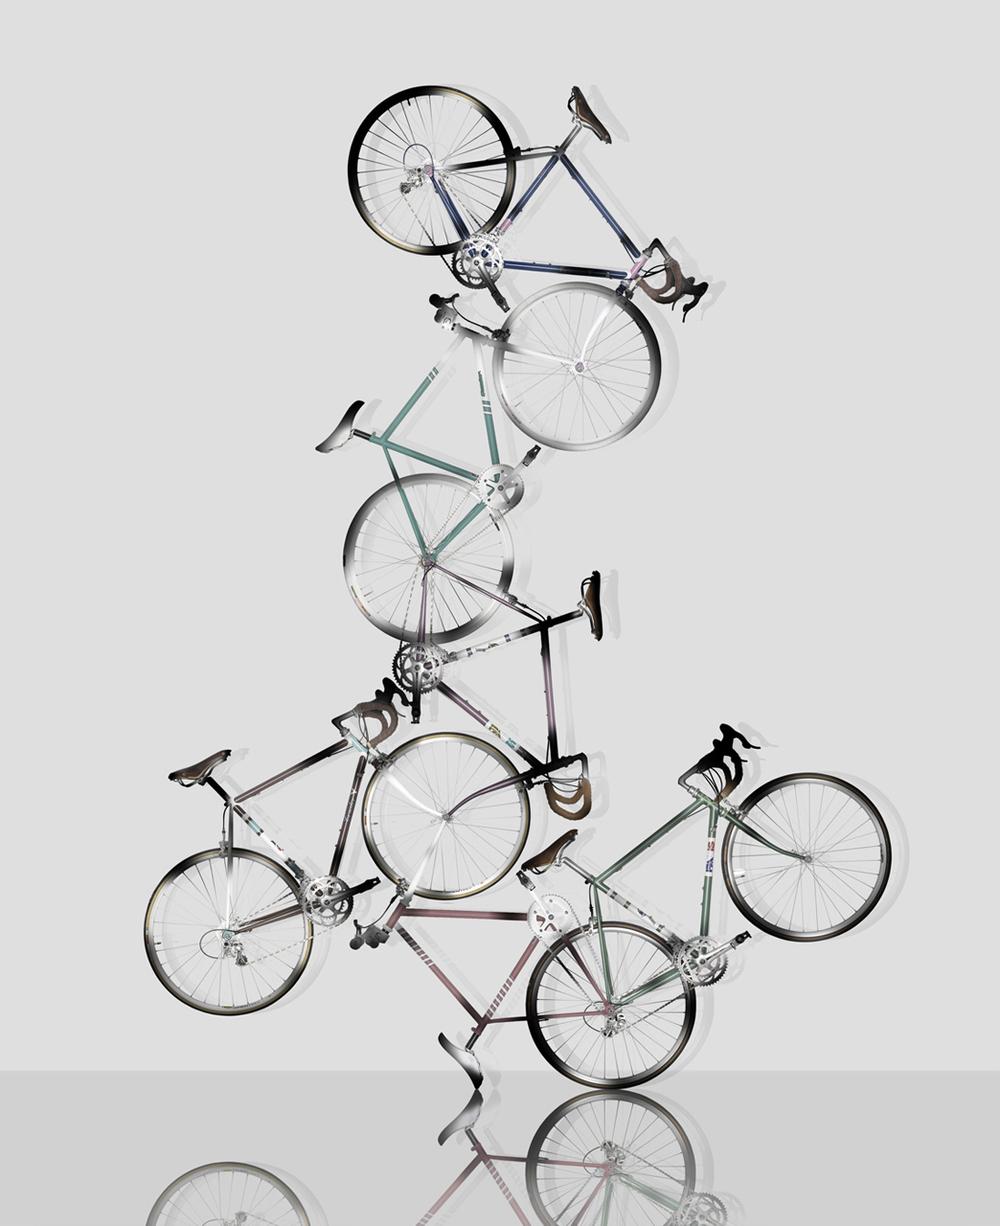 LouisaParry_Bikes1.jpg